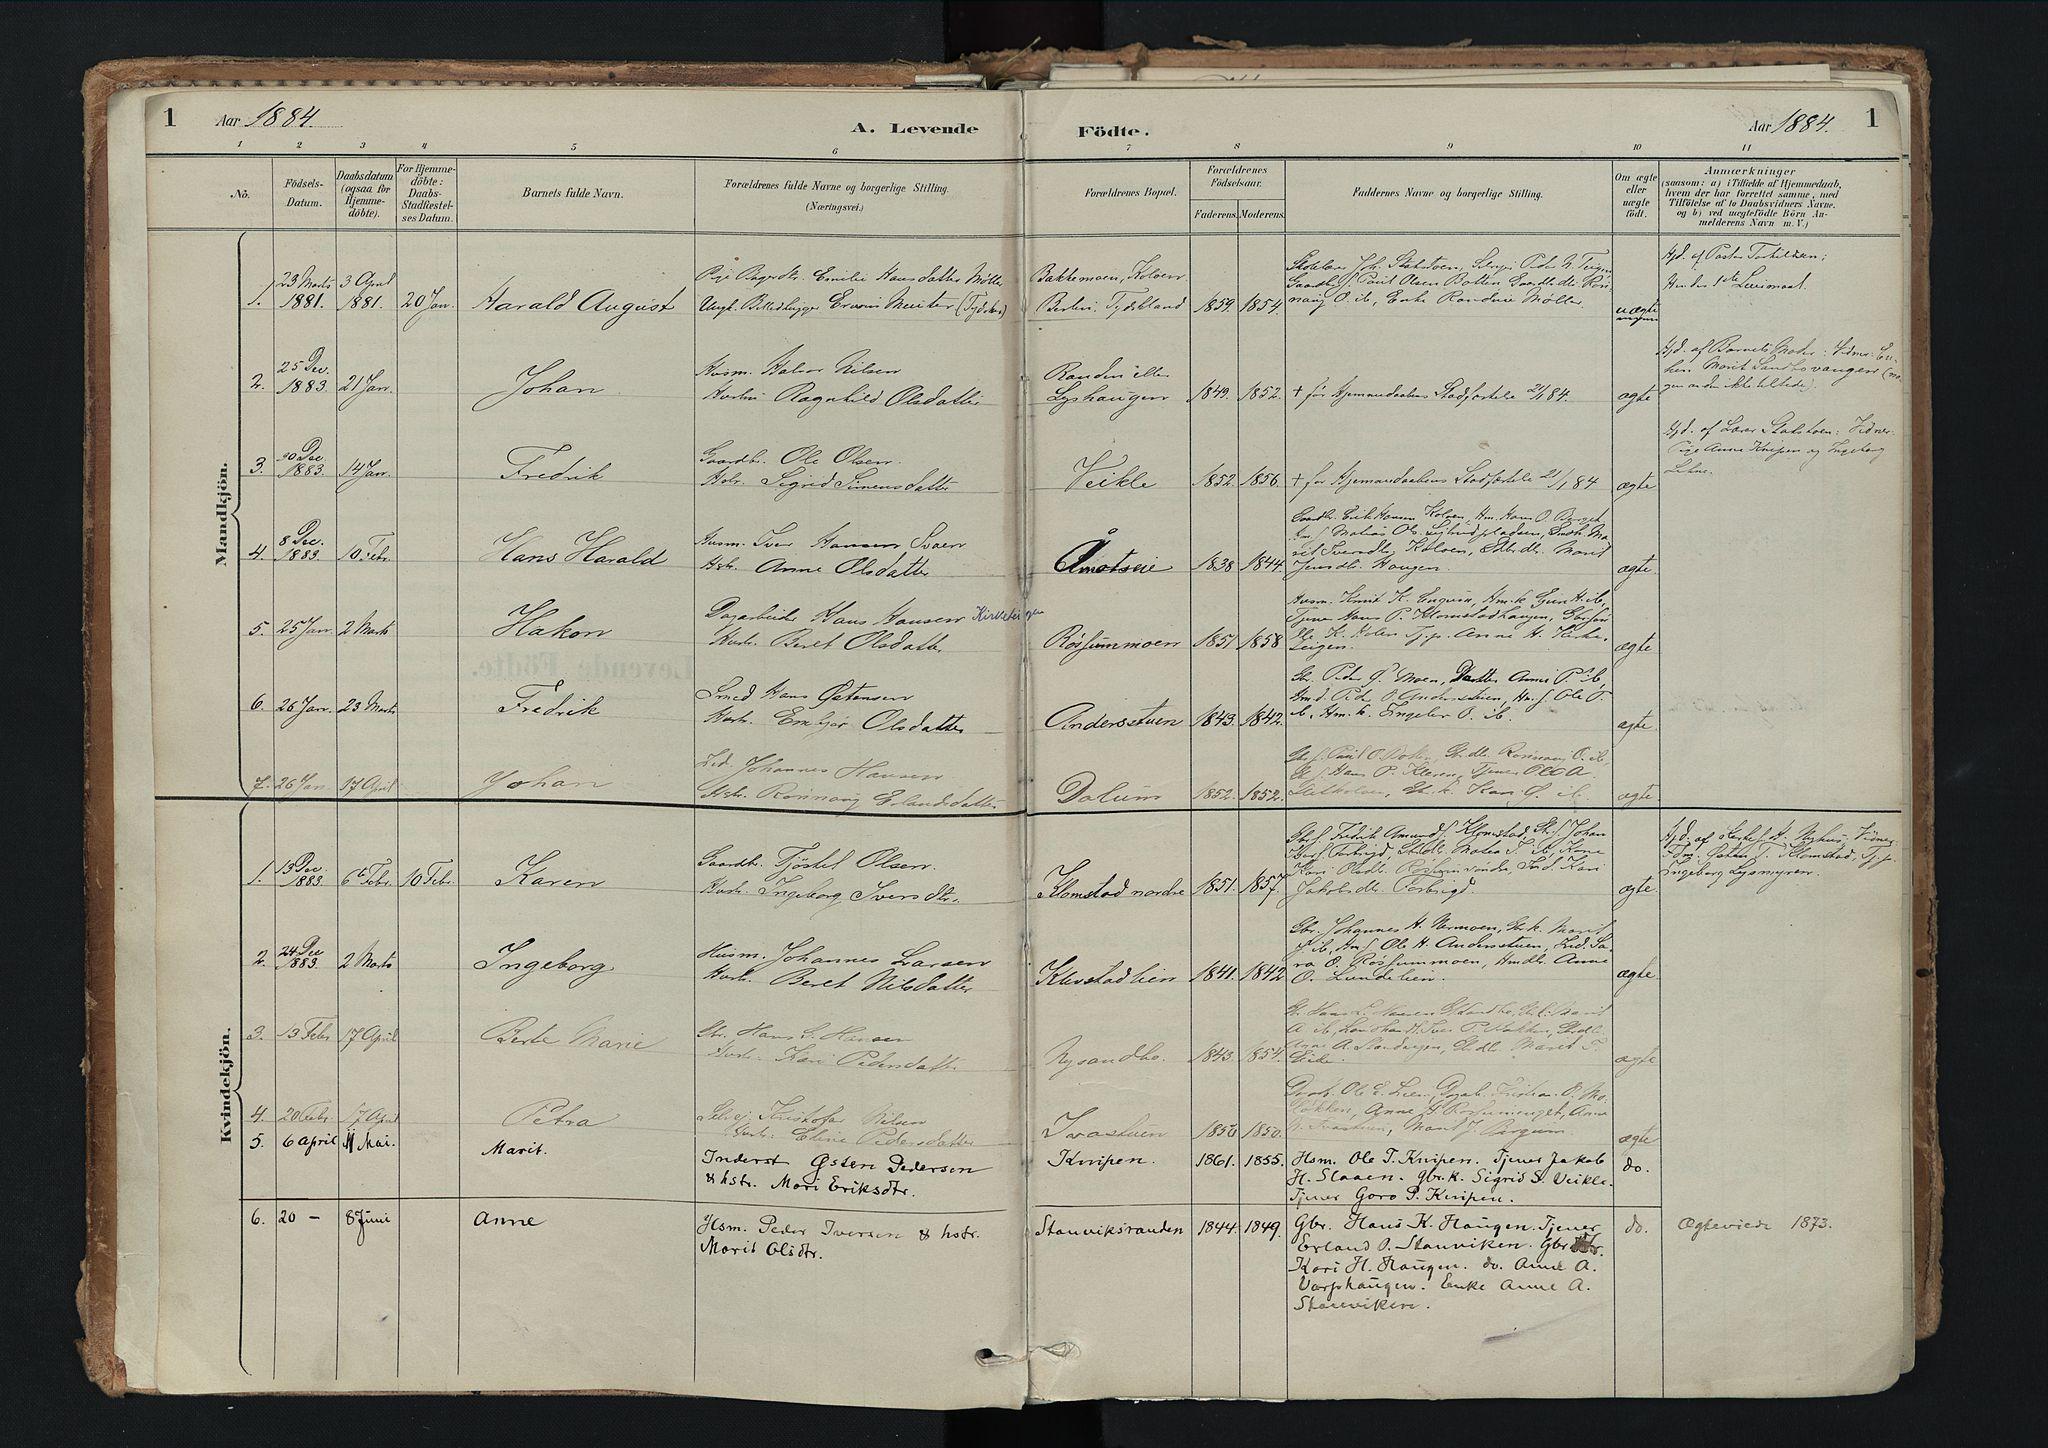 SAH, Nord-Fron prestekontor, Ministerialbok nr. 3, 1884-1914, s. 1